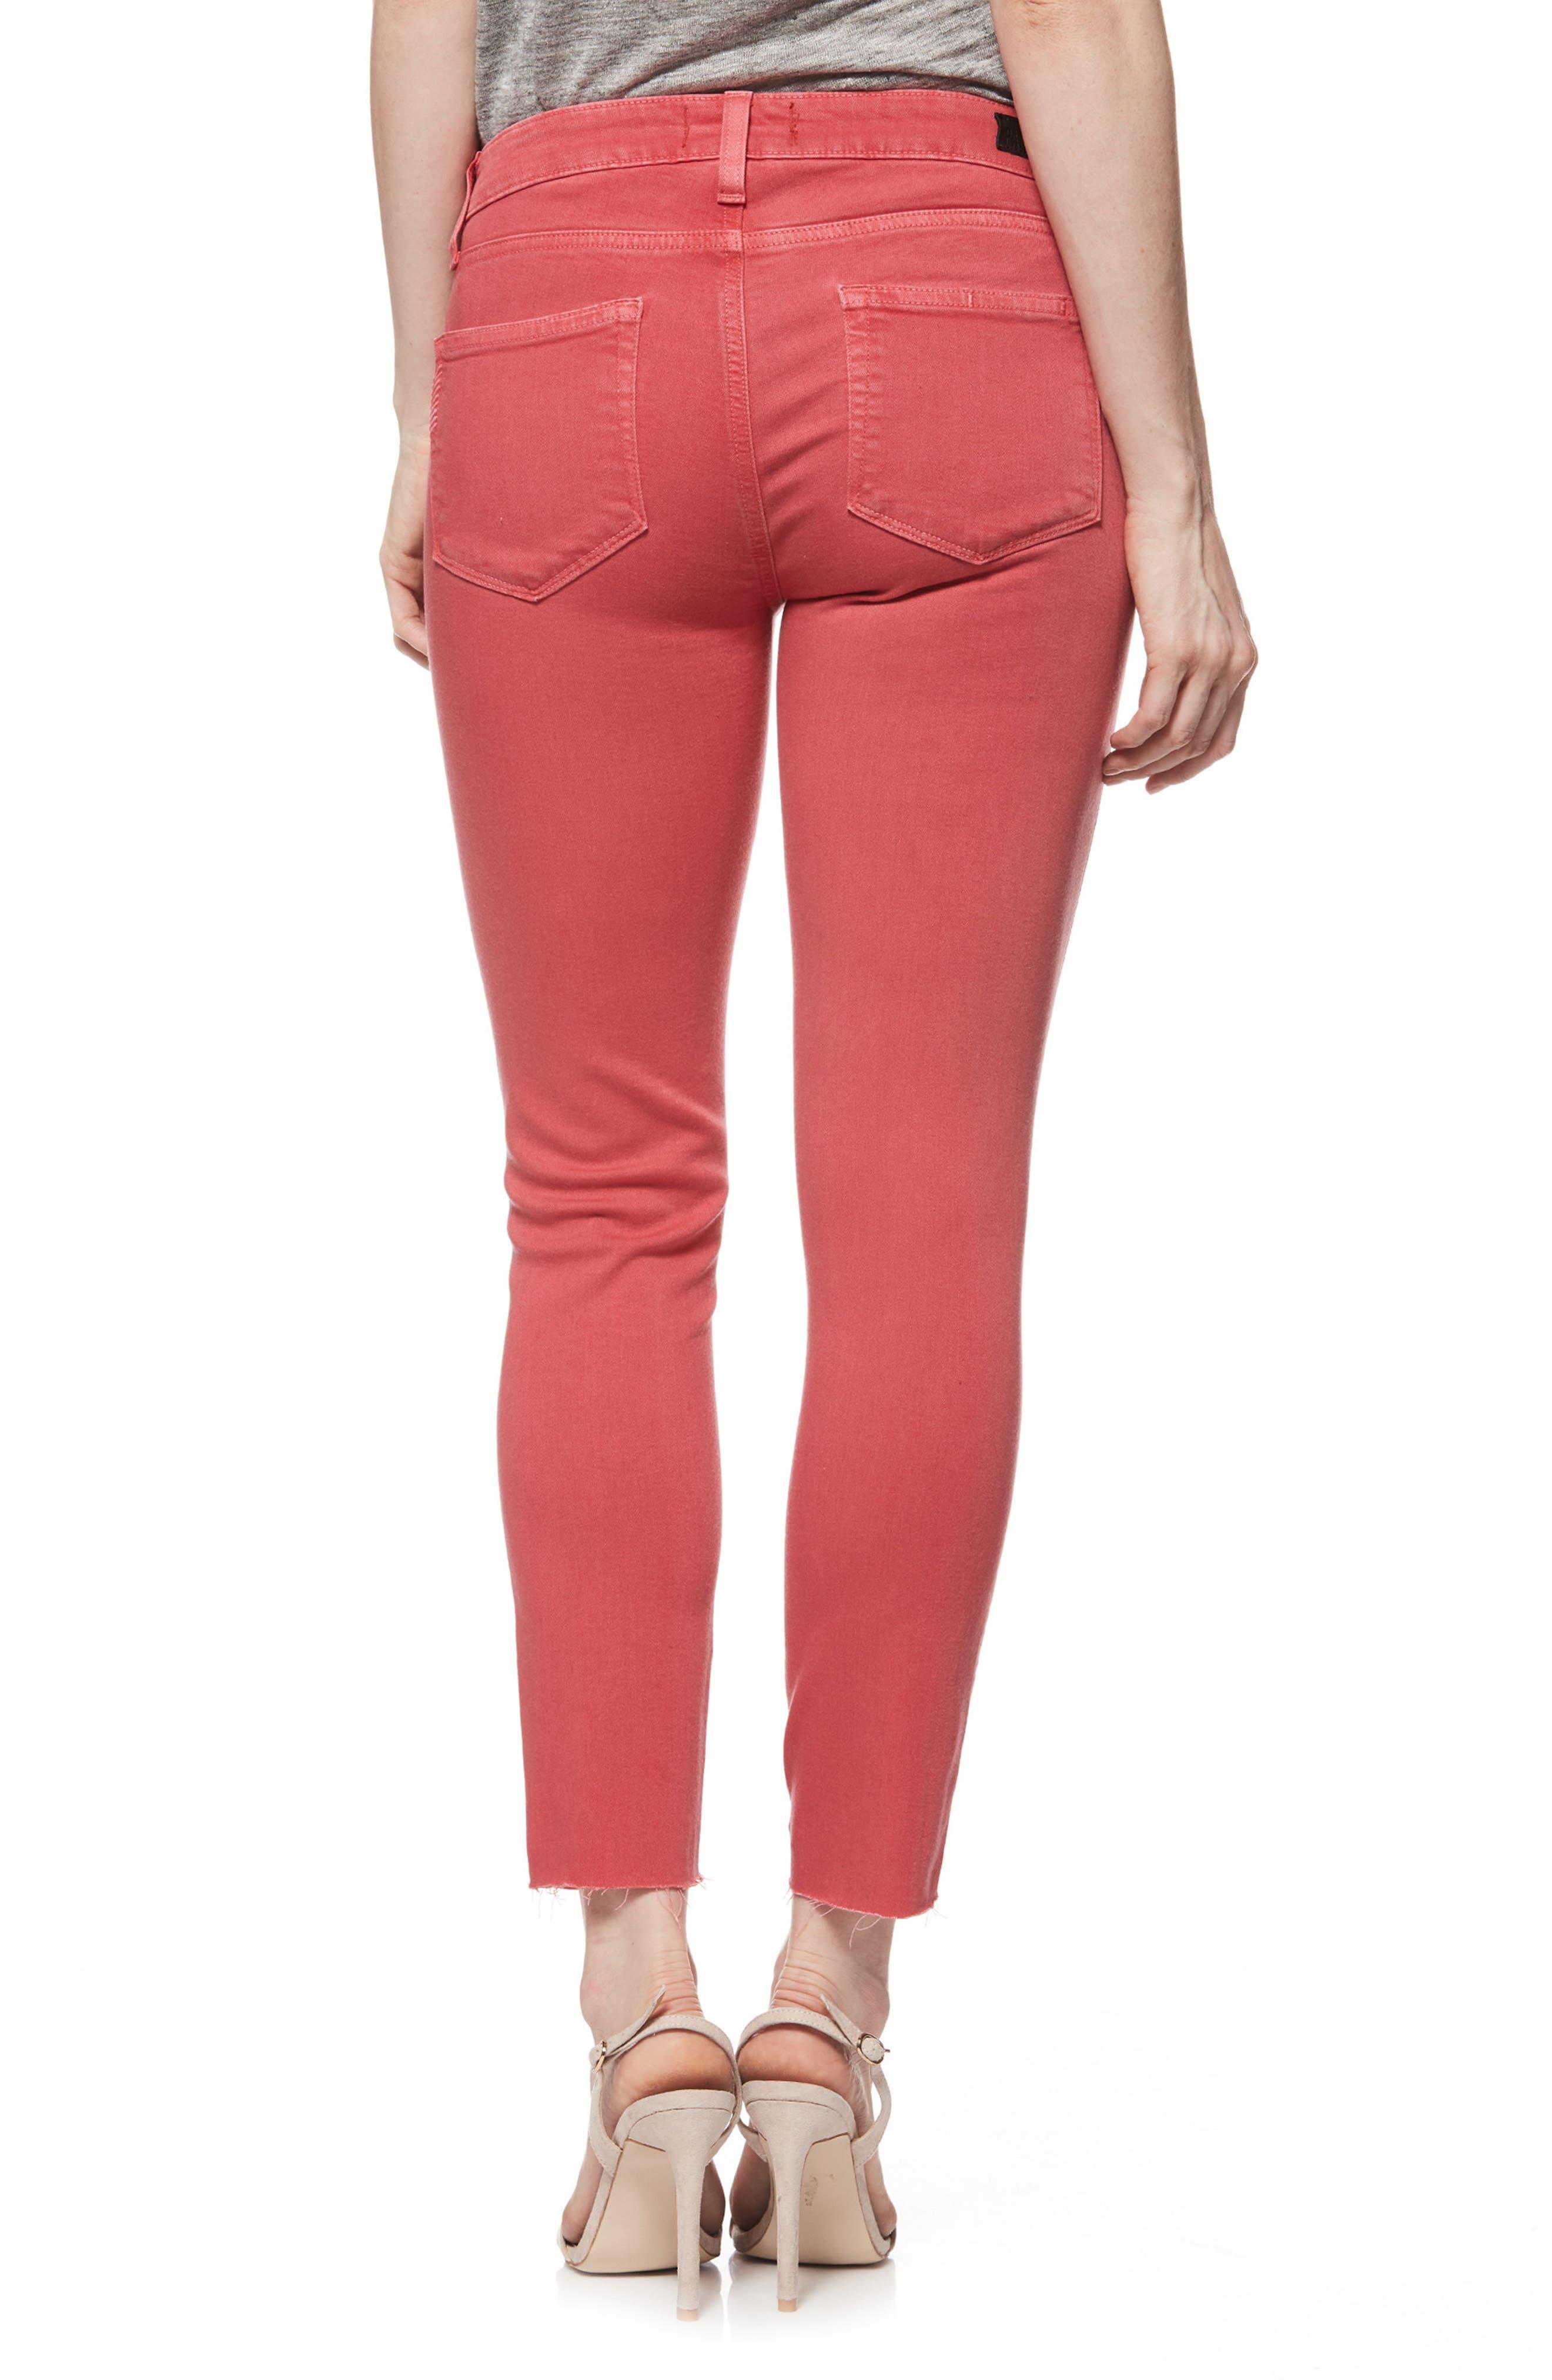 Transcend - Verdugo Raw Hem Crop Skinny Jeans,                             Alternate thumbnail 2, color,                             601